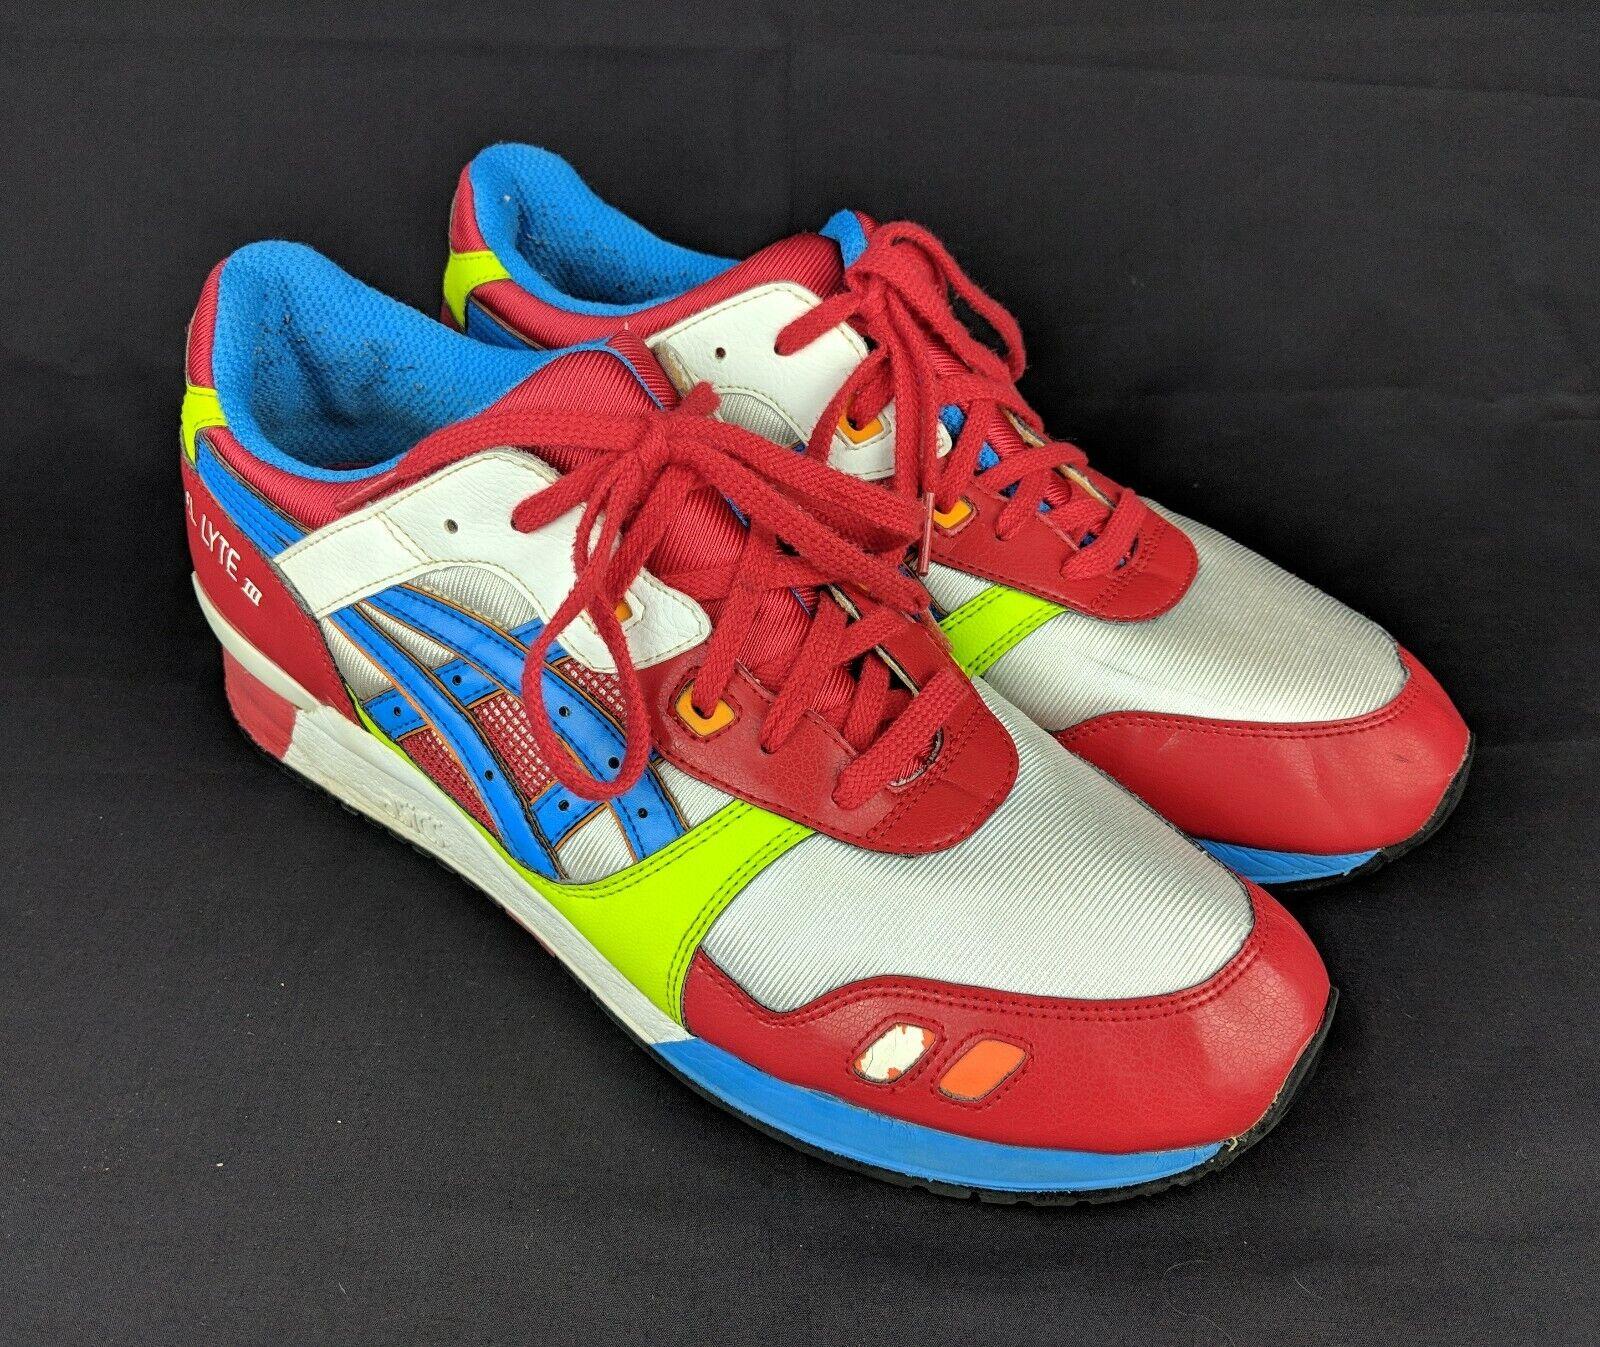 ASICS GEL LYTE III 3 athletic athletic athletic Sporty scarpe bianca blu  Flame HQ81K Uomo 13 GUC 632c00